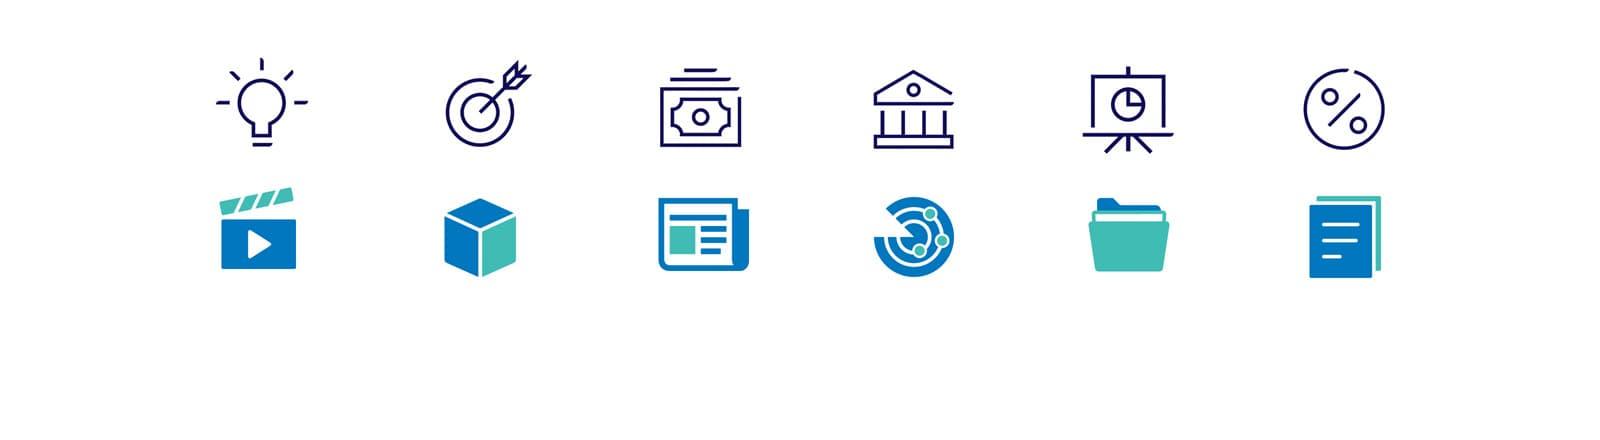 TradeStation - Icons